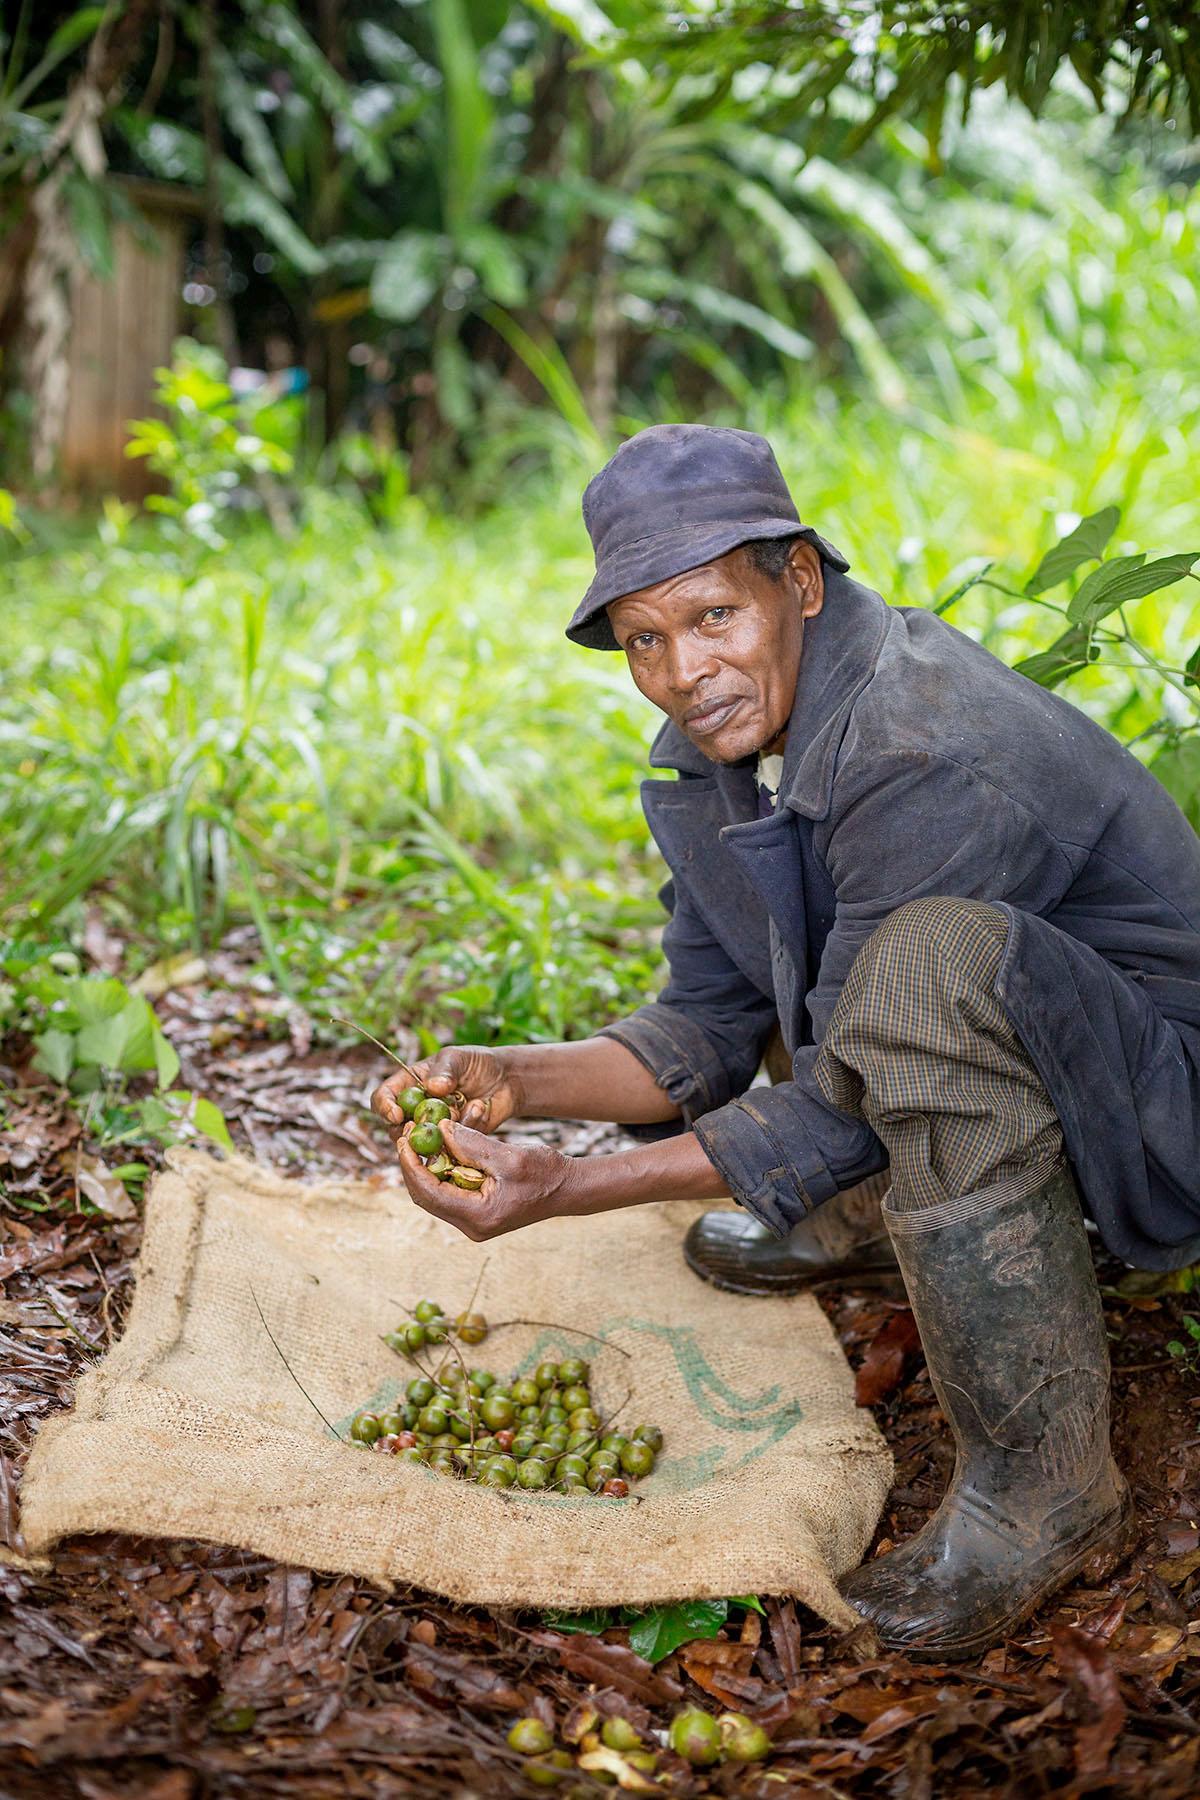 A nut grower forages for macadamia nuts in Kirinyaga County, Kenya.